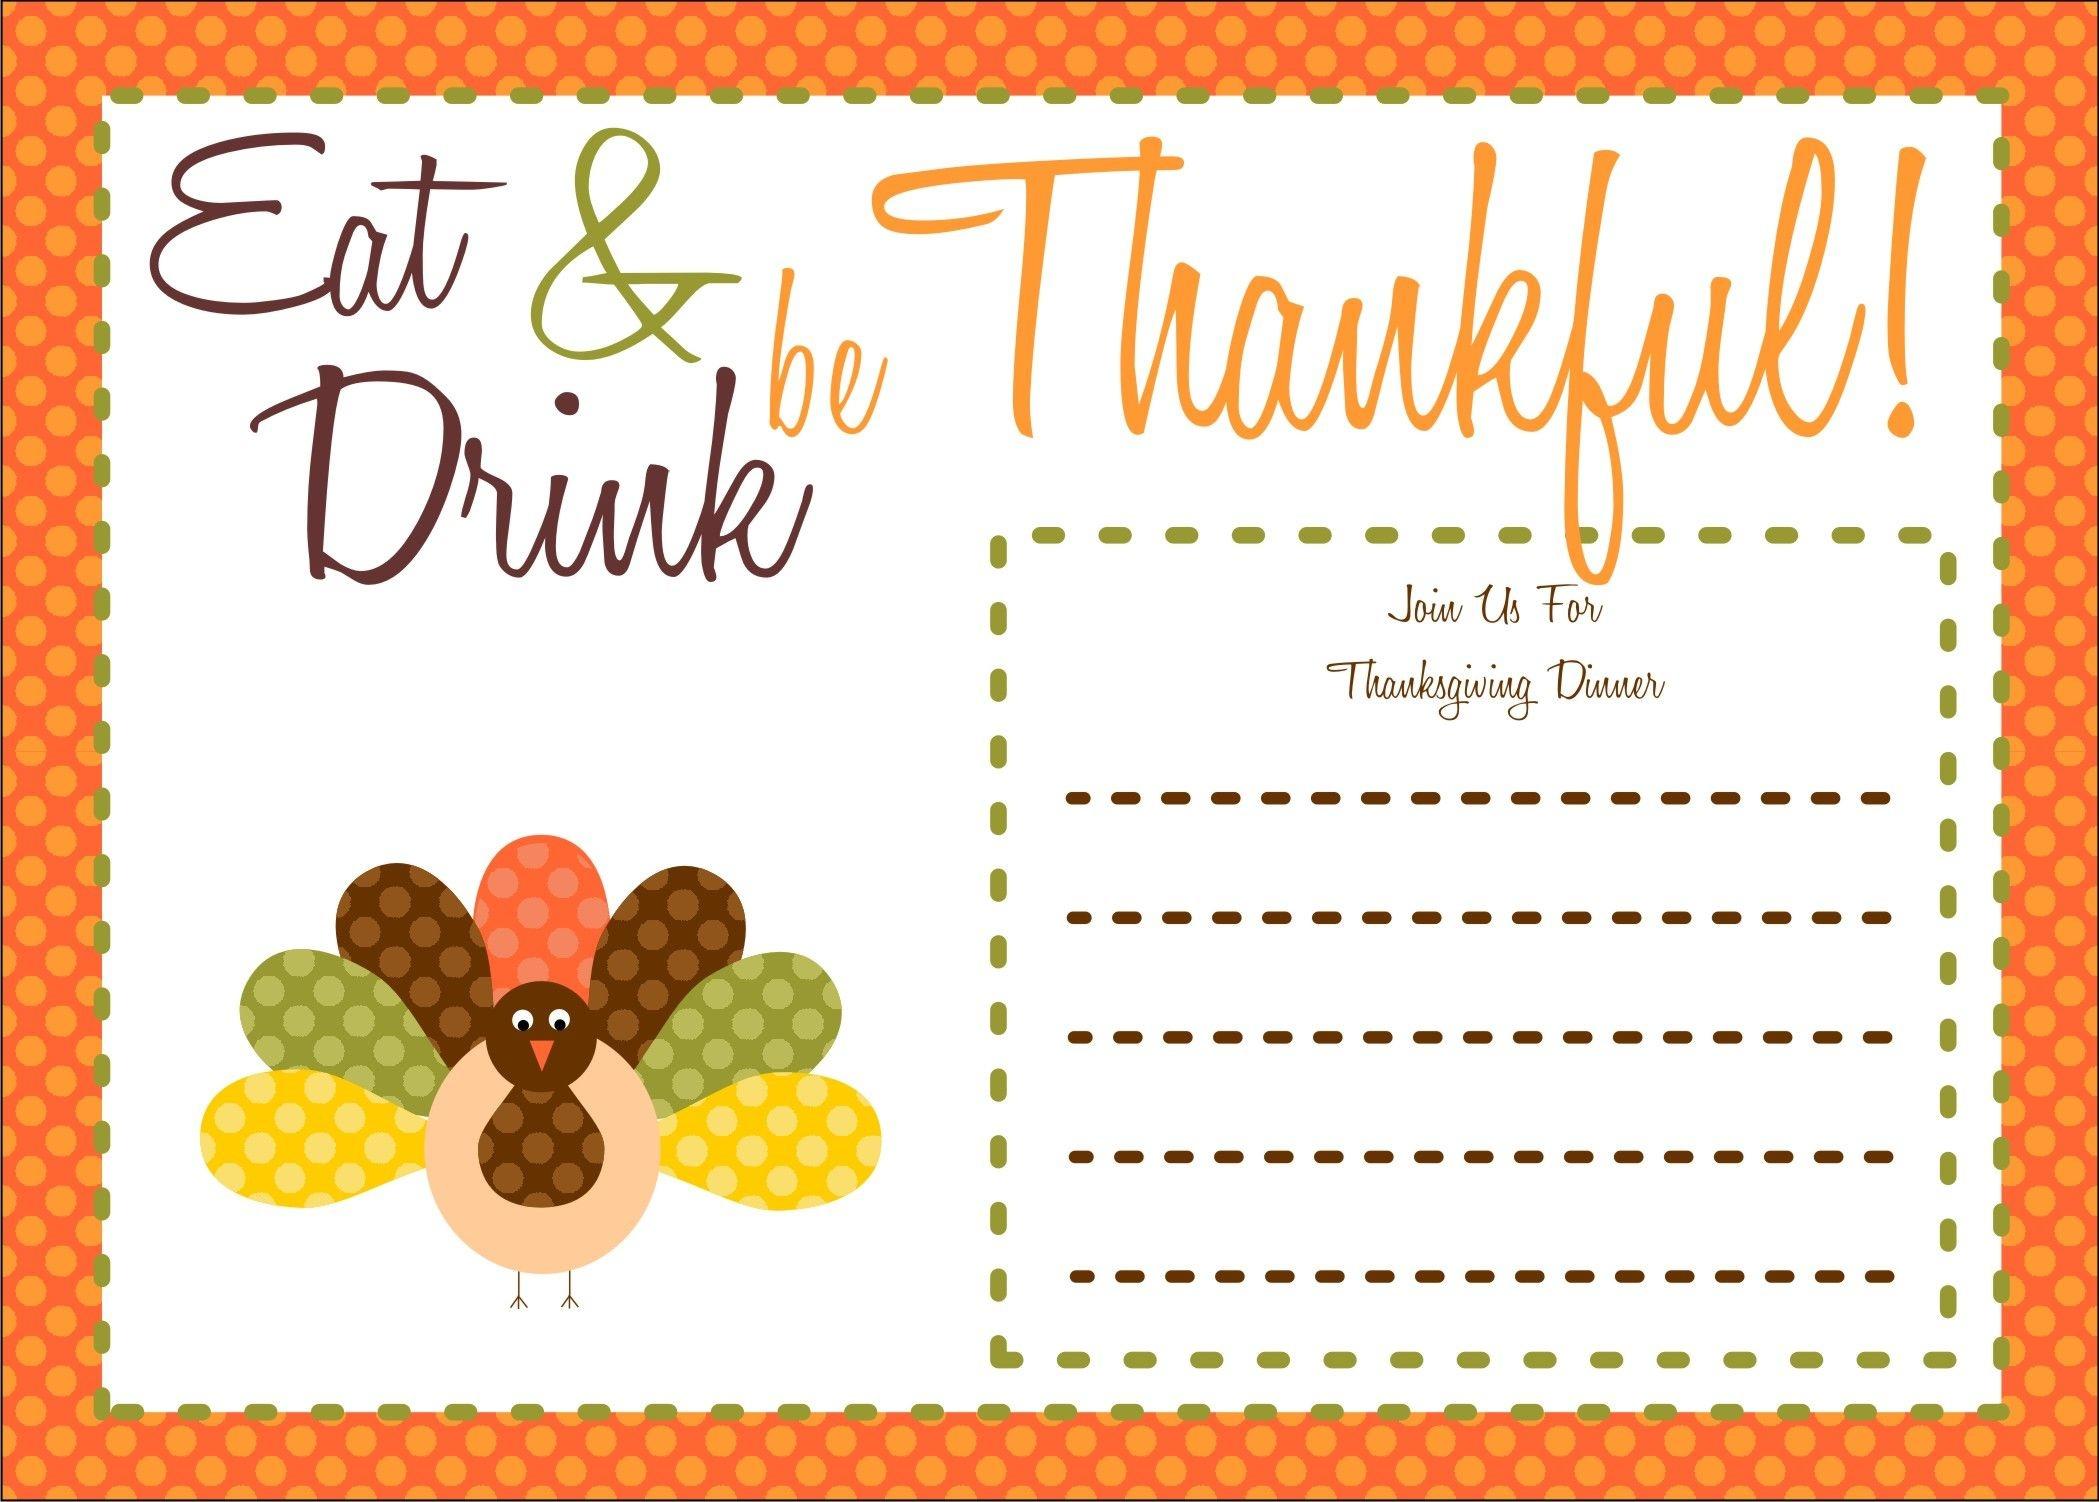 022 Free Thanksgiving Invitationteste Ideas Printable Of Postcard - Free Printable Thanksgiving Invitation Templates